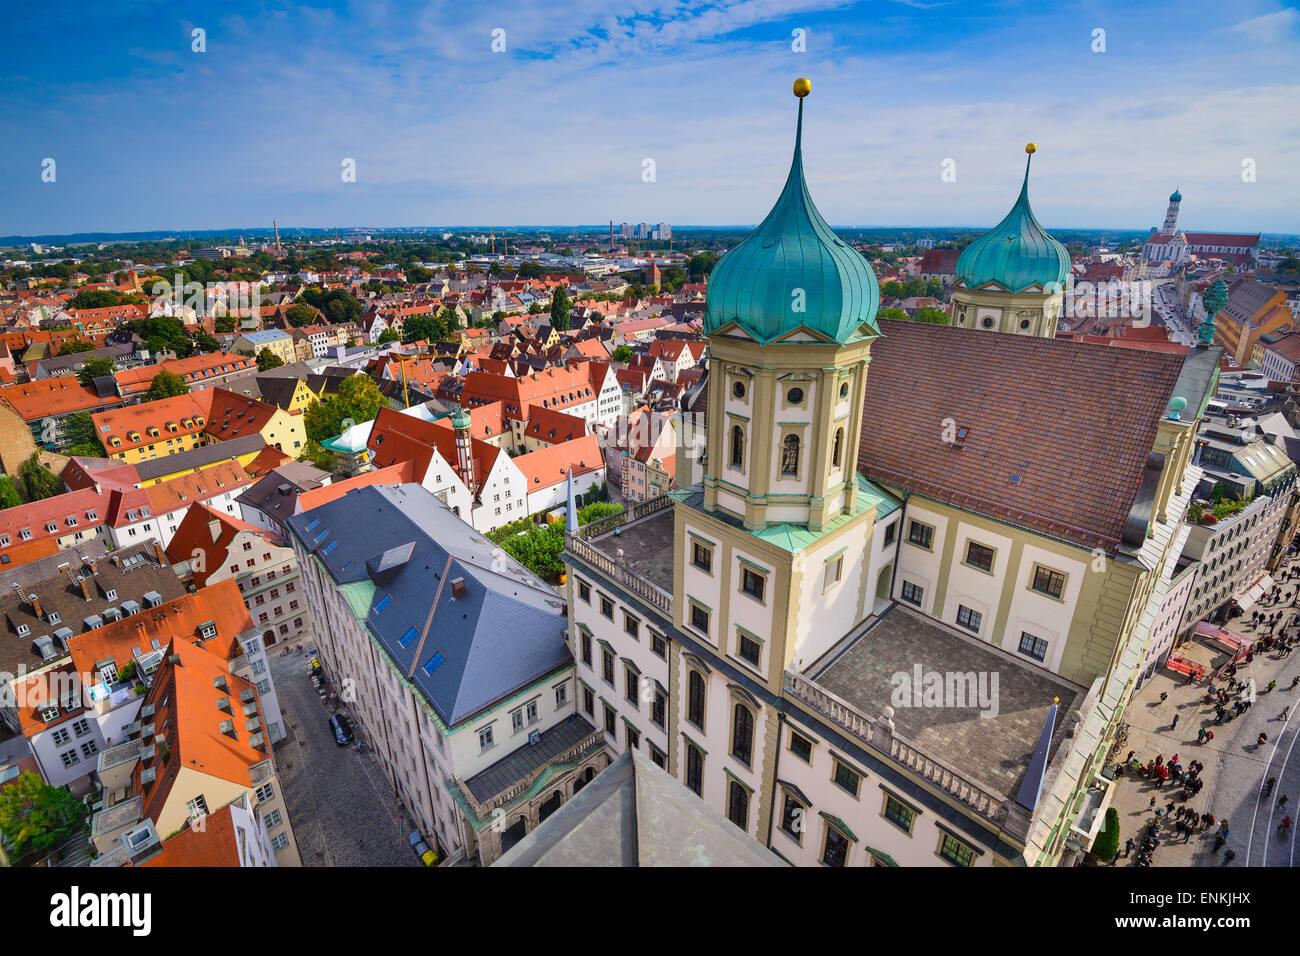 Augsburg, Alemania casco antiguo paisaje urbano. Imagen De Stock